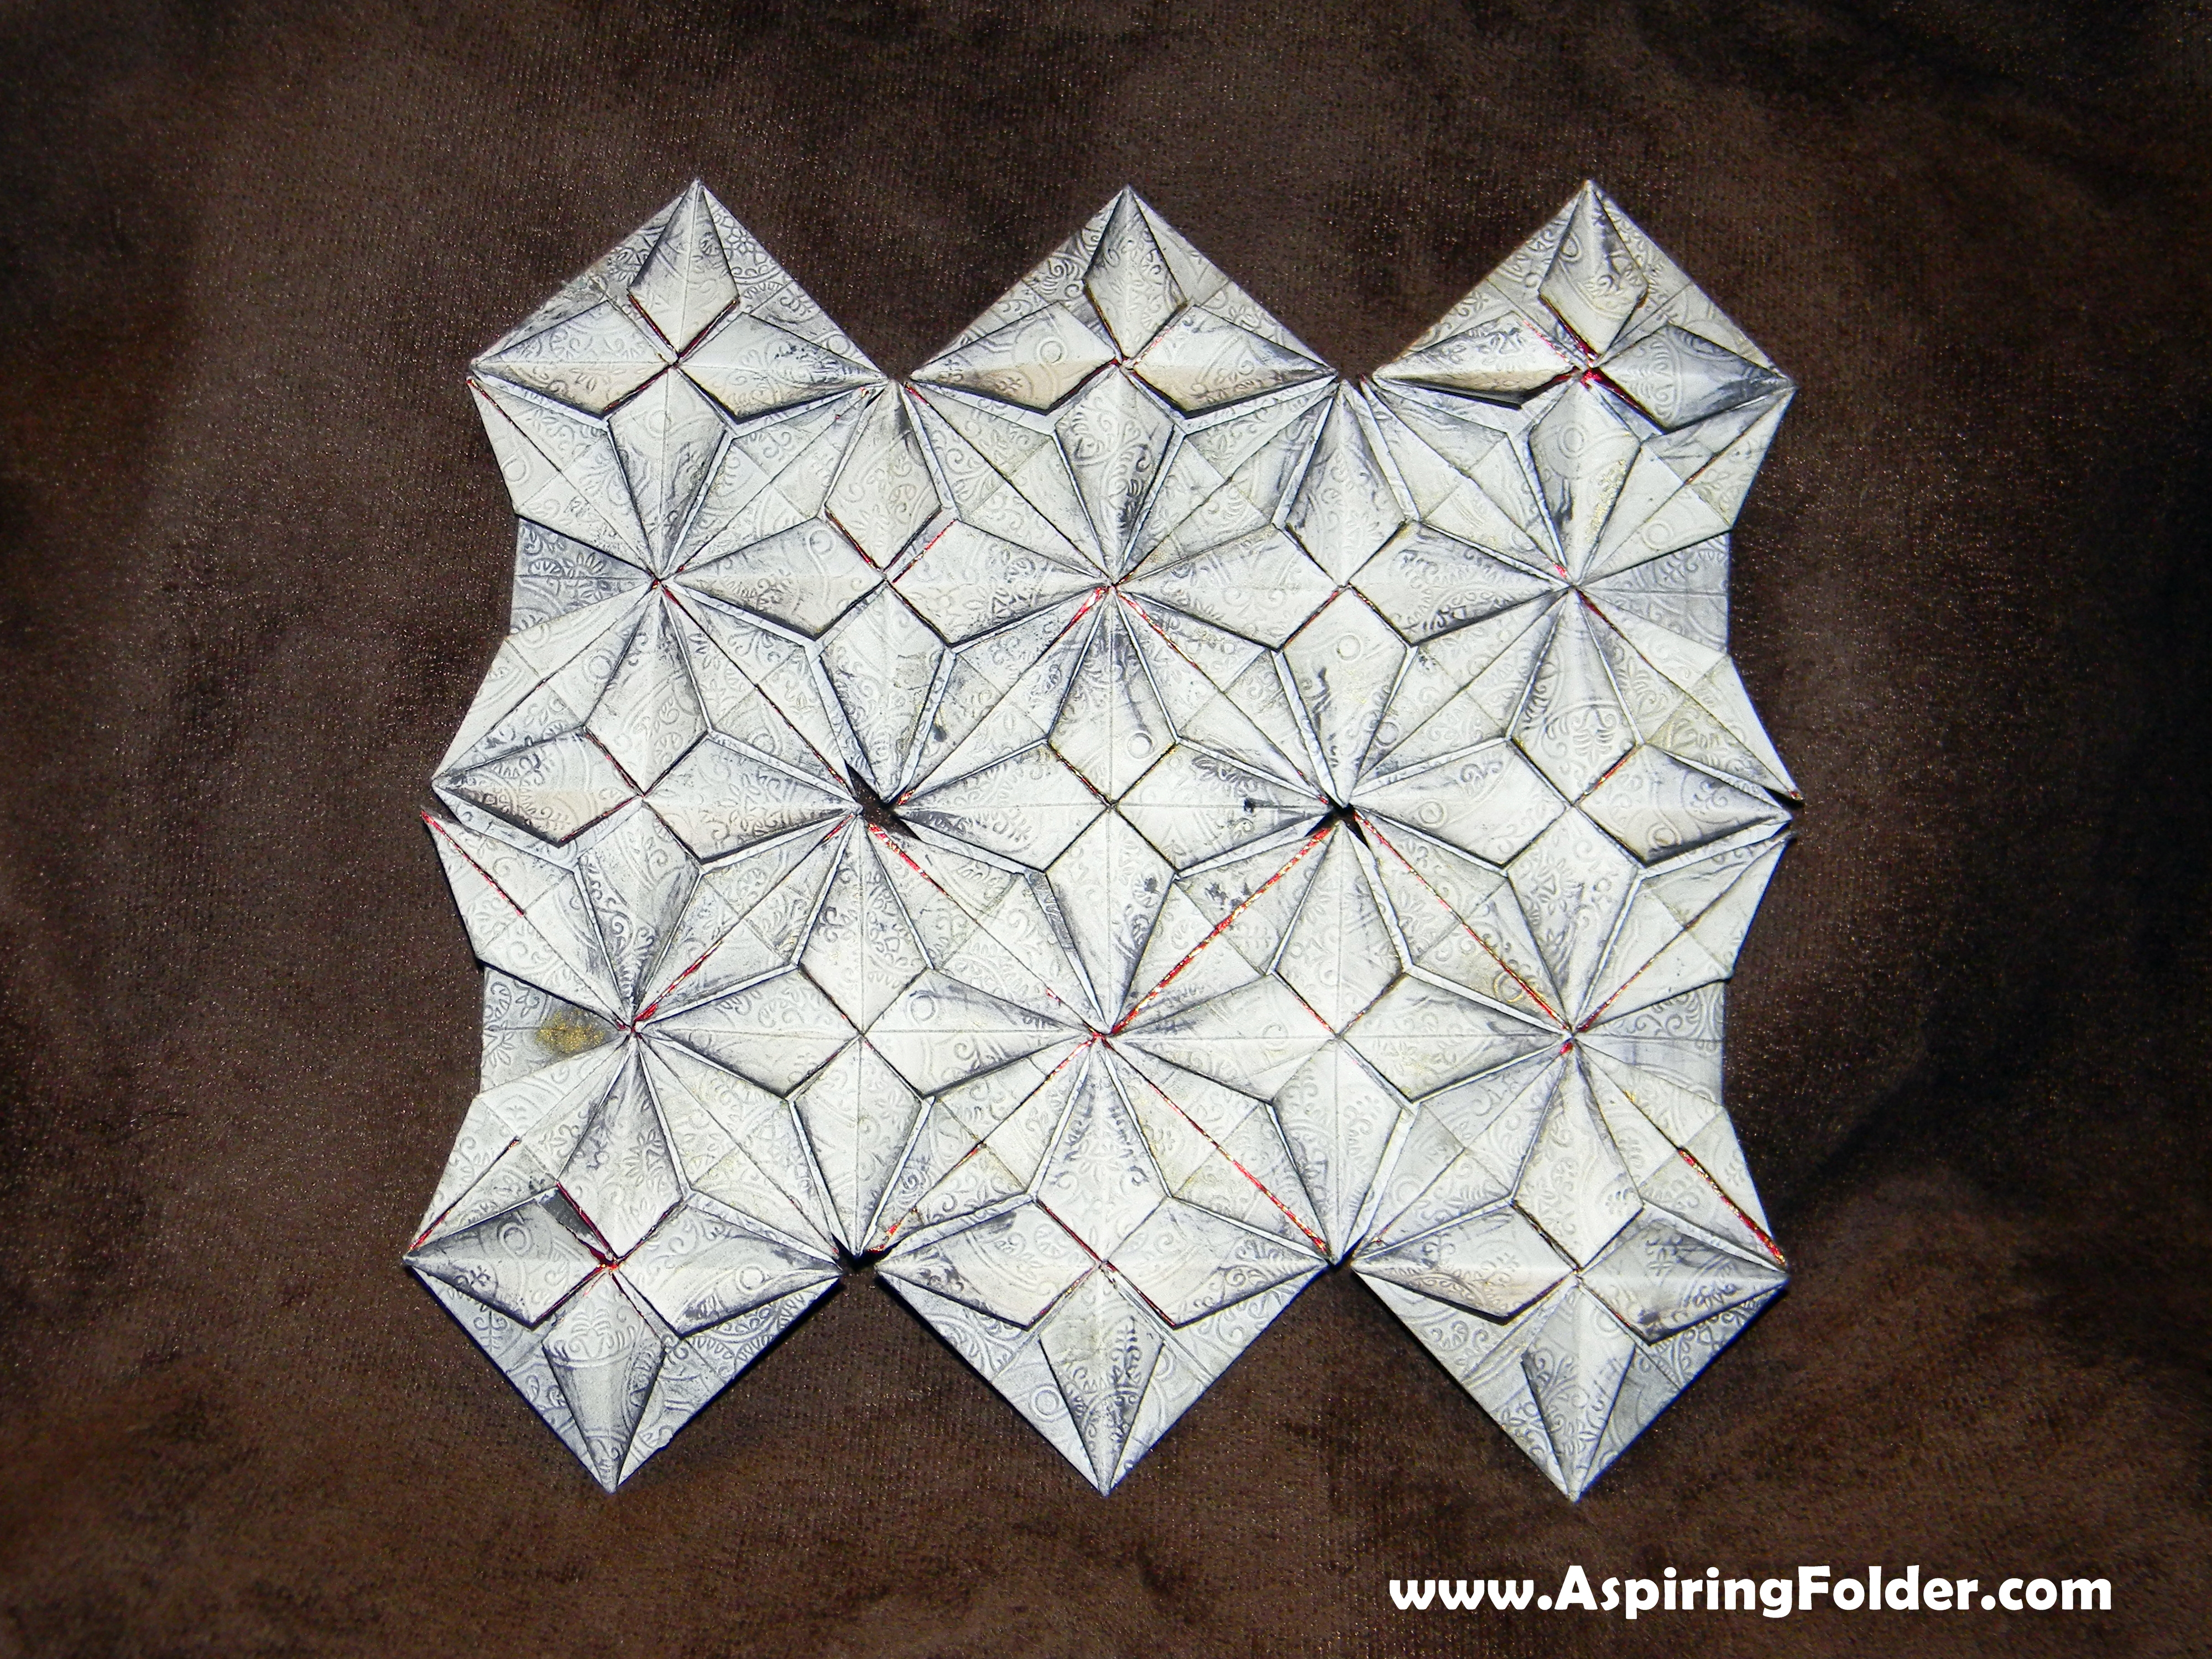 Easy Origami Quilt | Aspiring Folder - photo#11